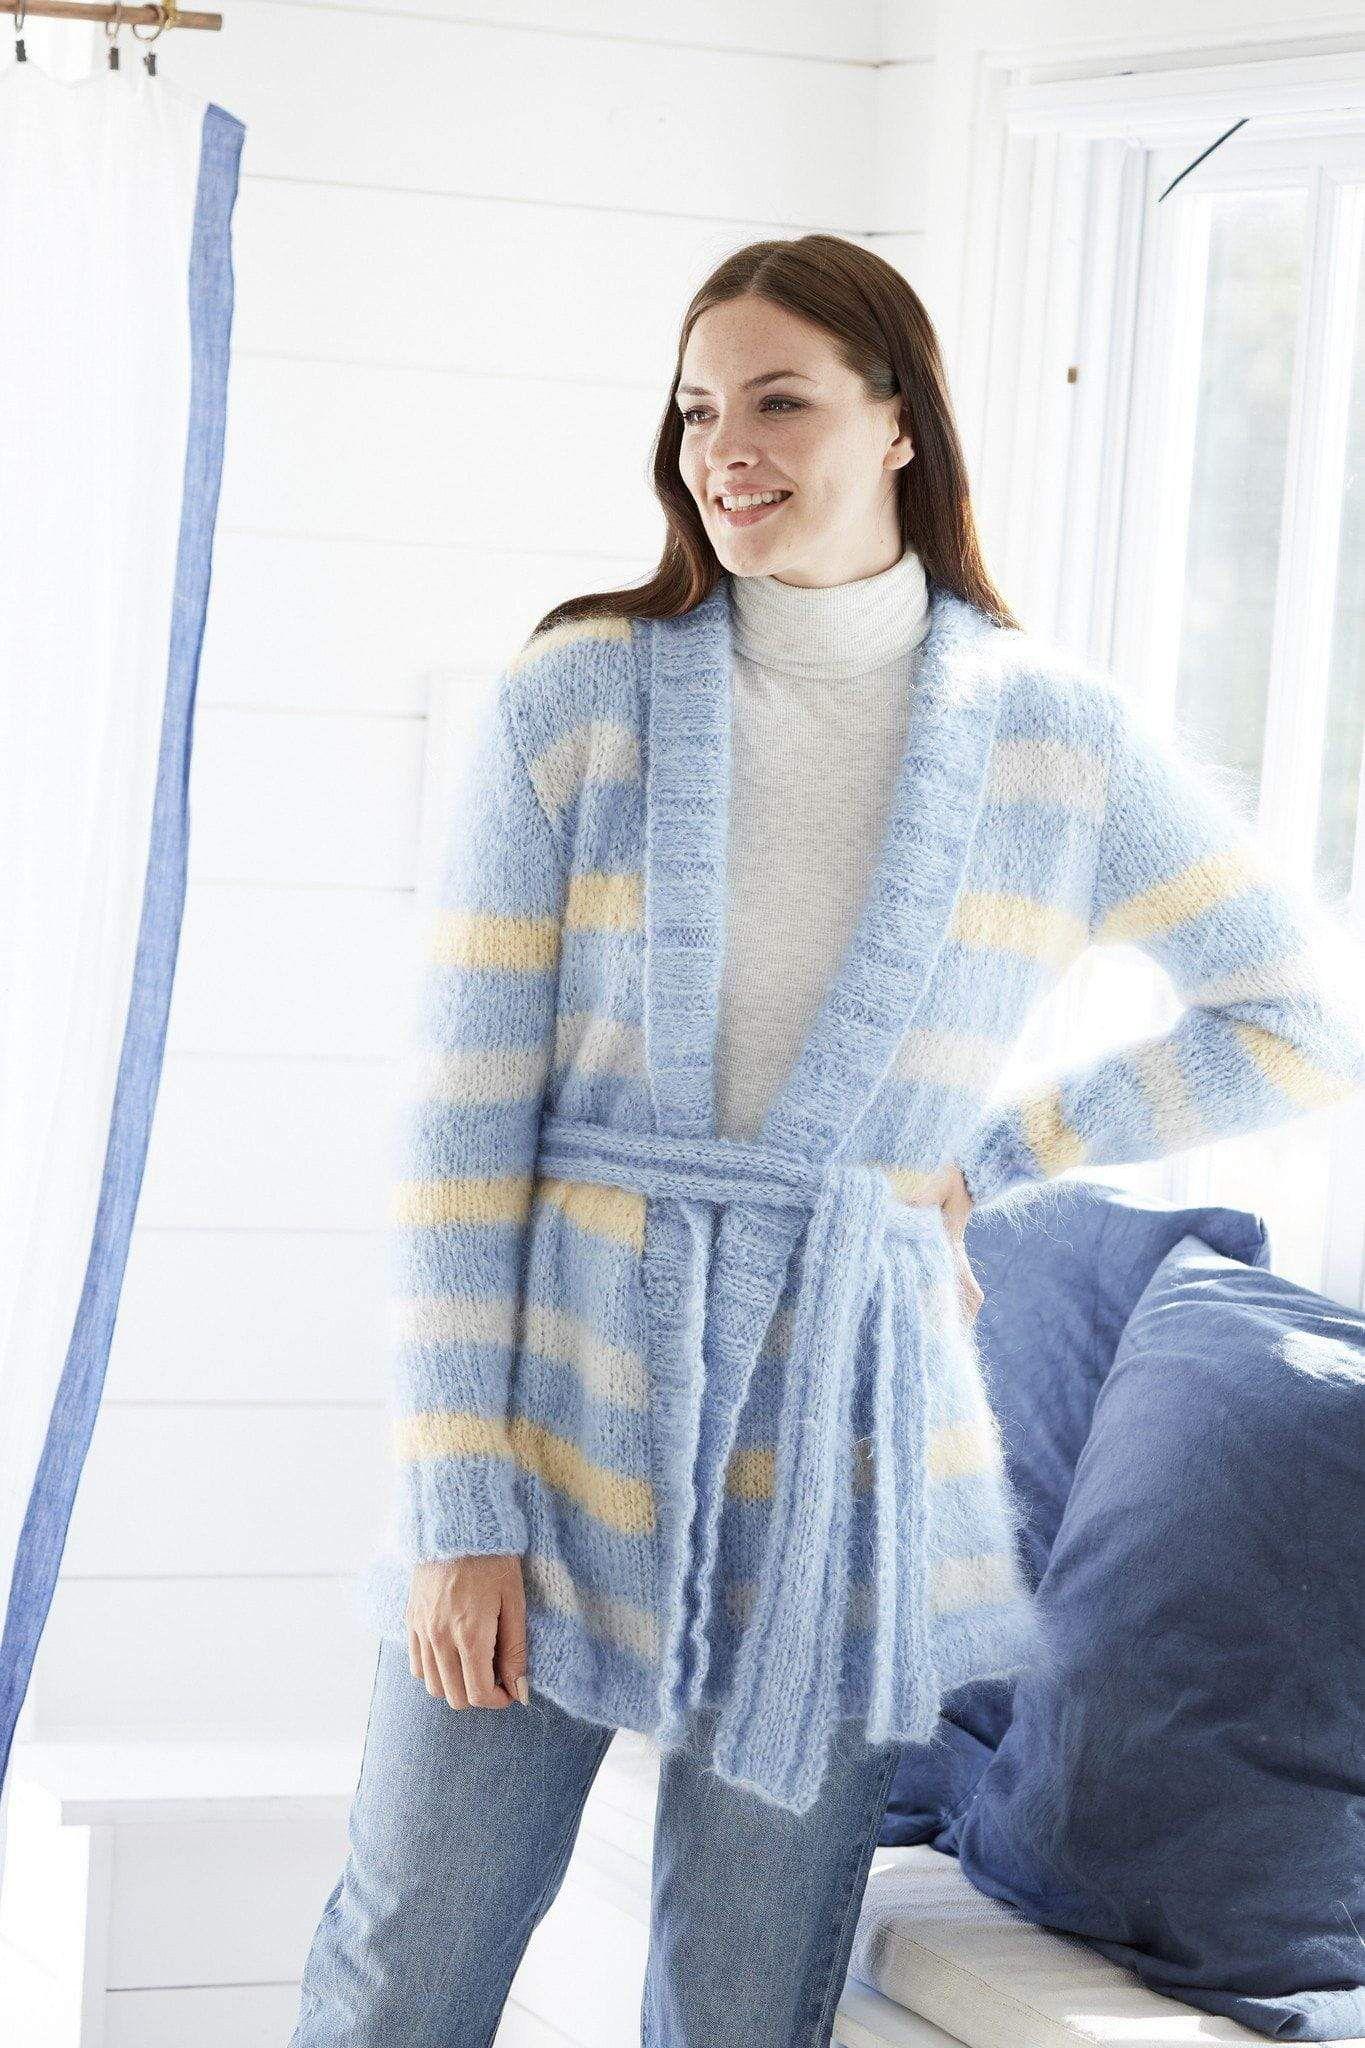 Mohair Striped Cardigan Knitting Pattern The Knitting